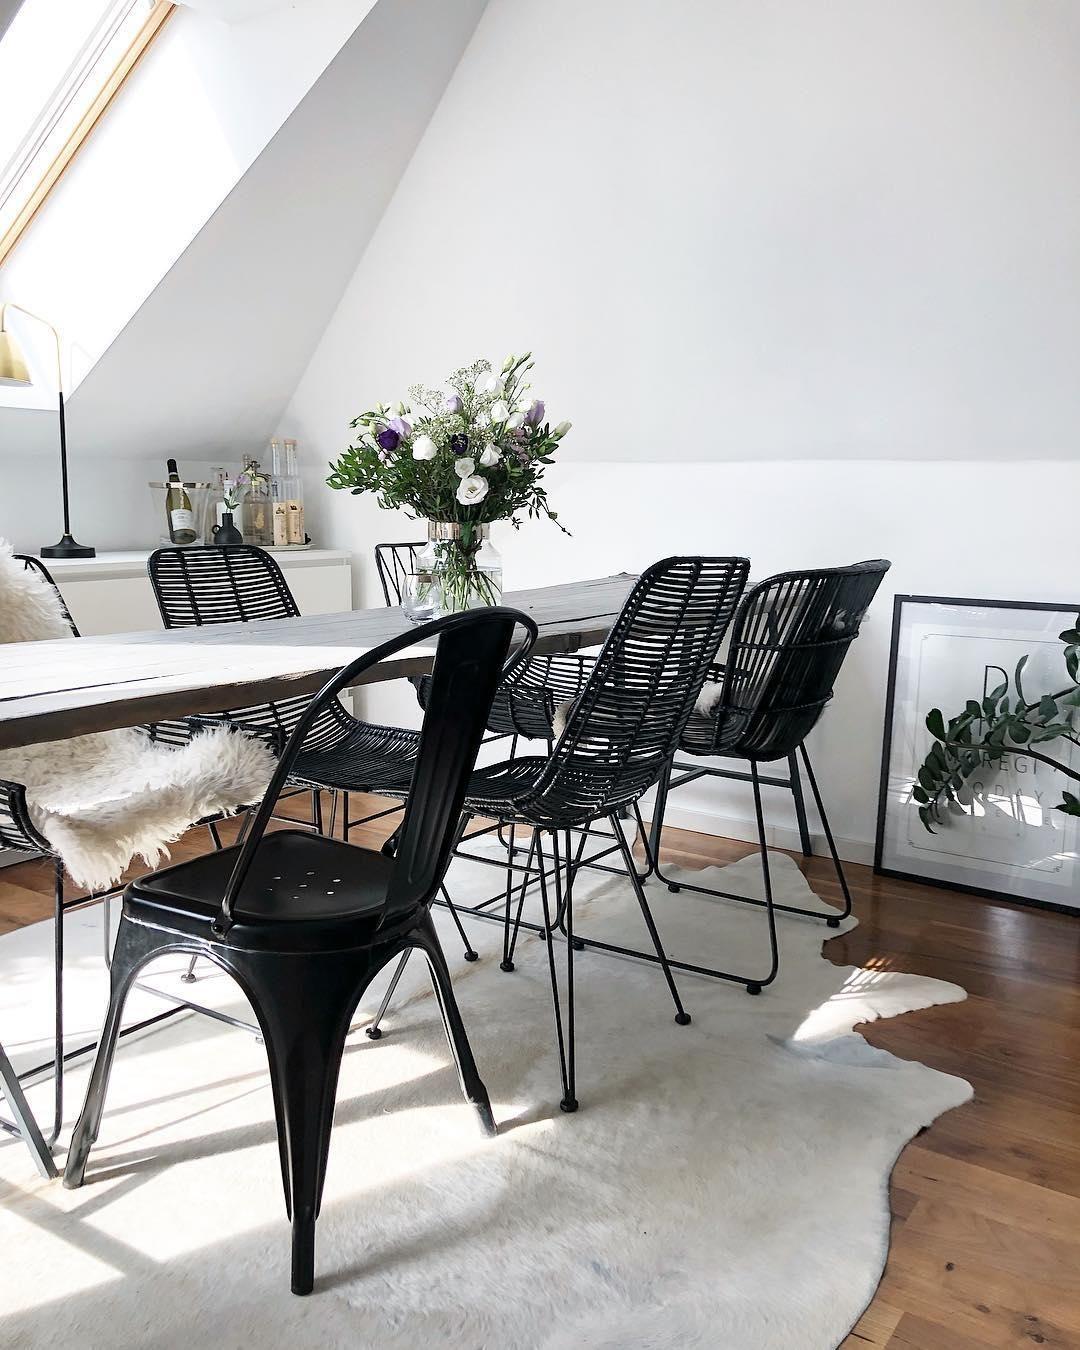 Einfaches hausfarbendesign draußen stuhl bobby in   esszimmer  pinterest  living room room and